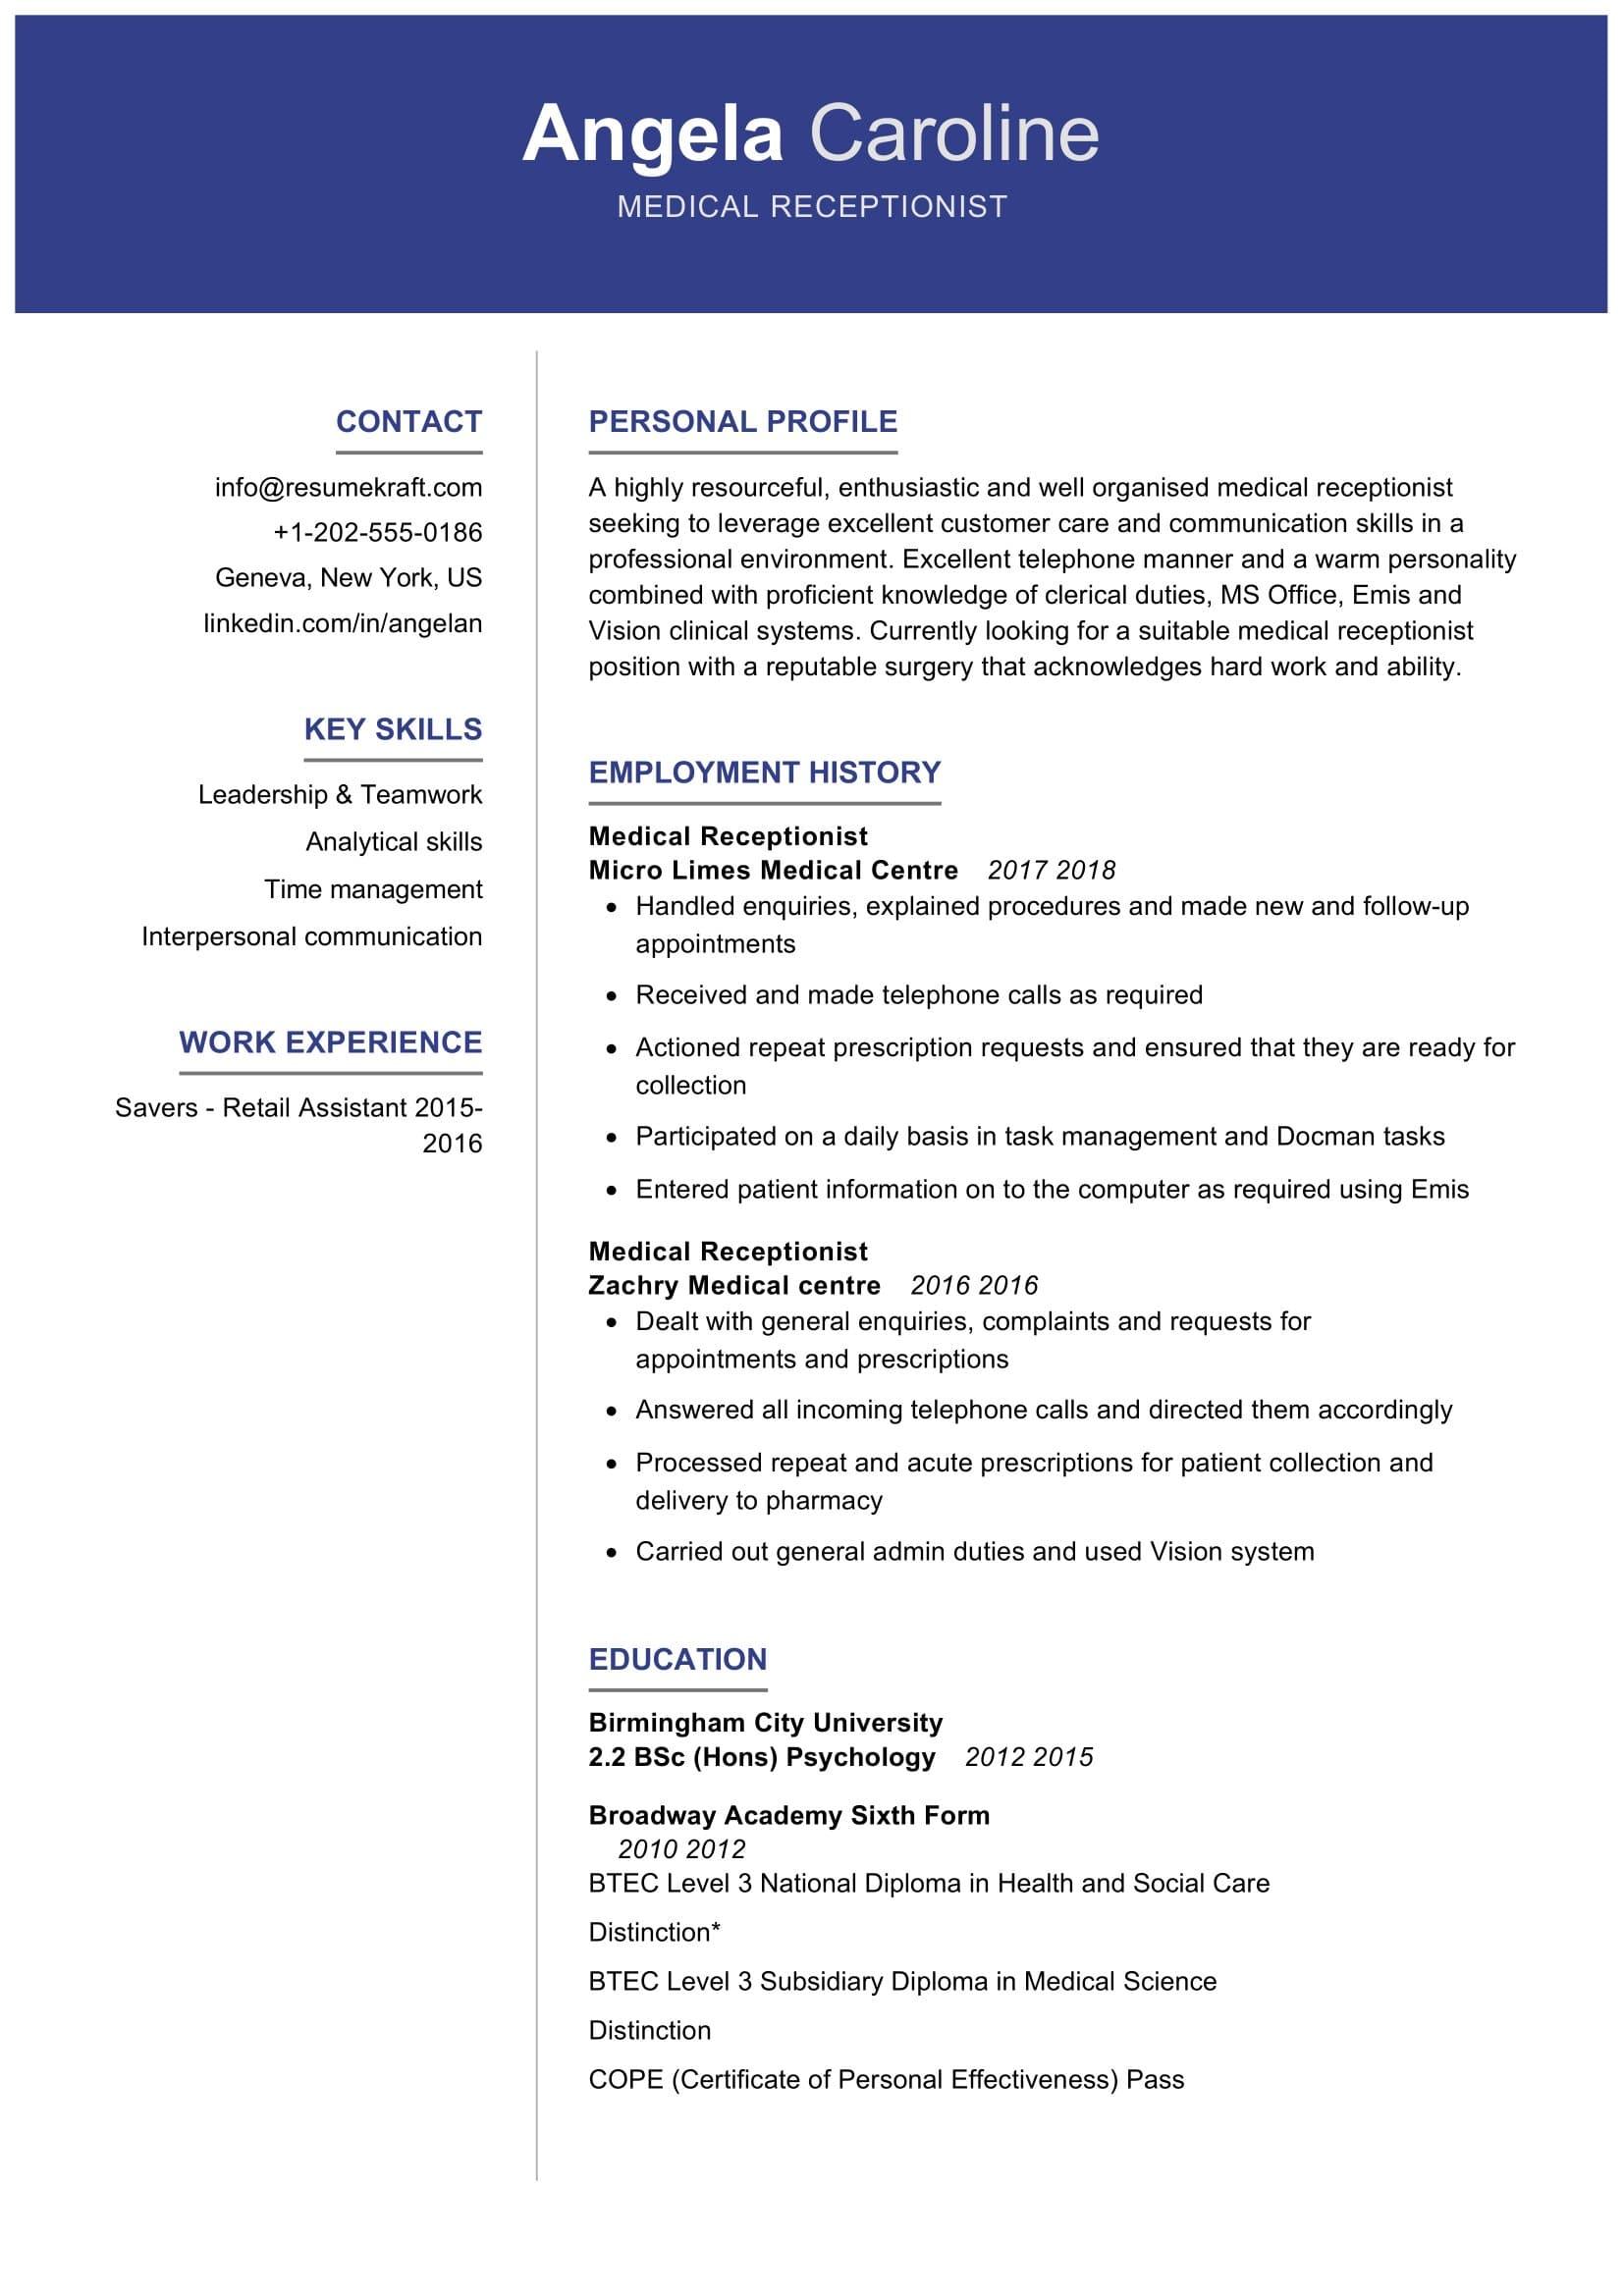 medical receptionist resume sample  resumekraft